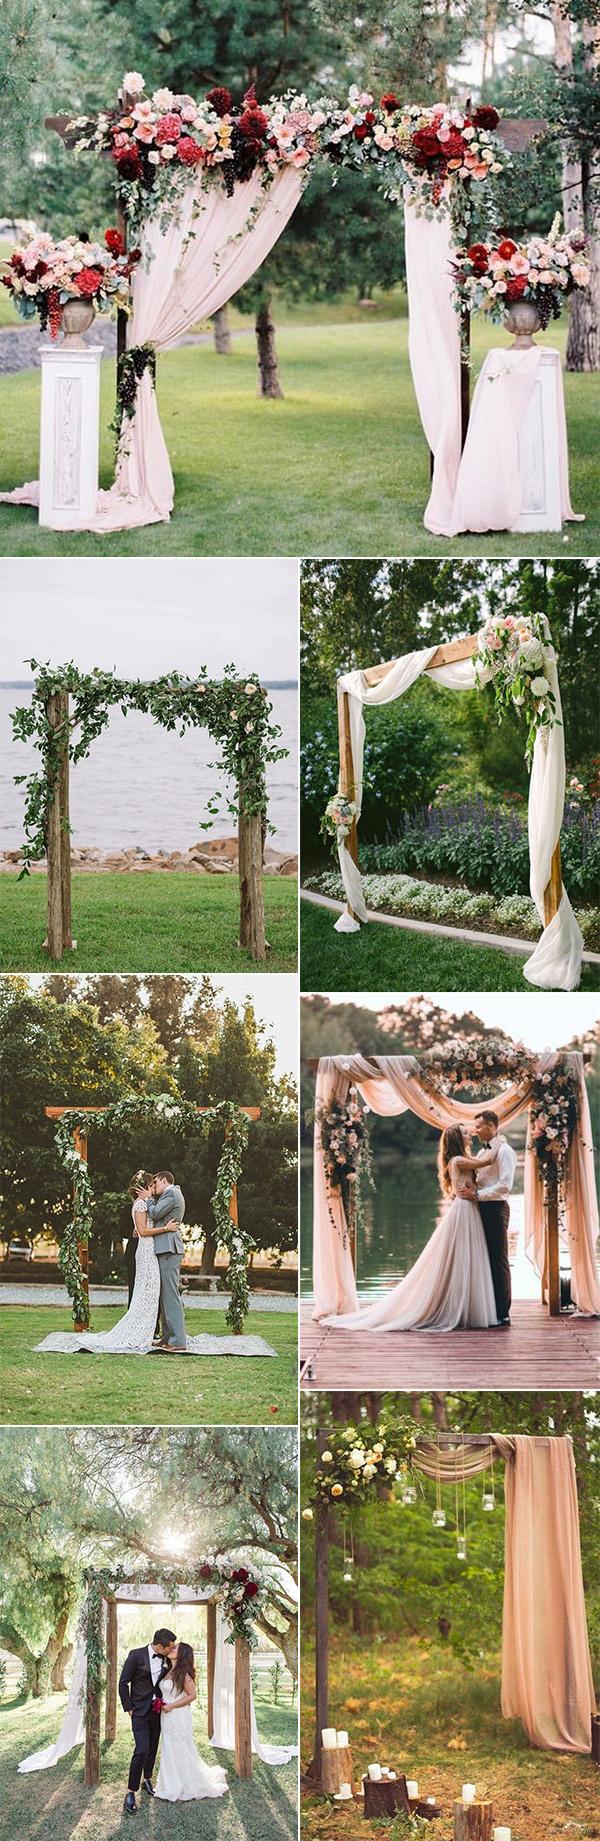 Wedding Ideas Decoration 35 Brilliant Outdoor Wedding Decoration Ideas For 2018 Trends